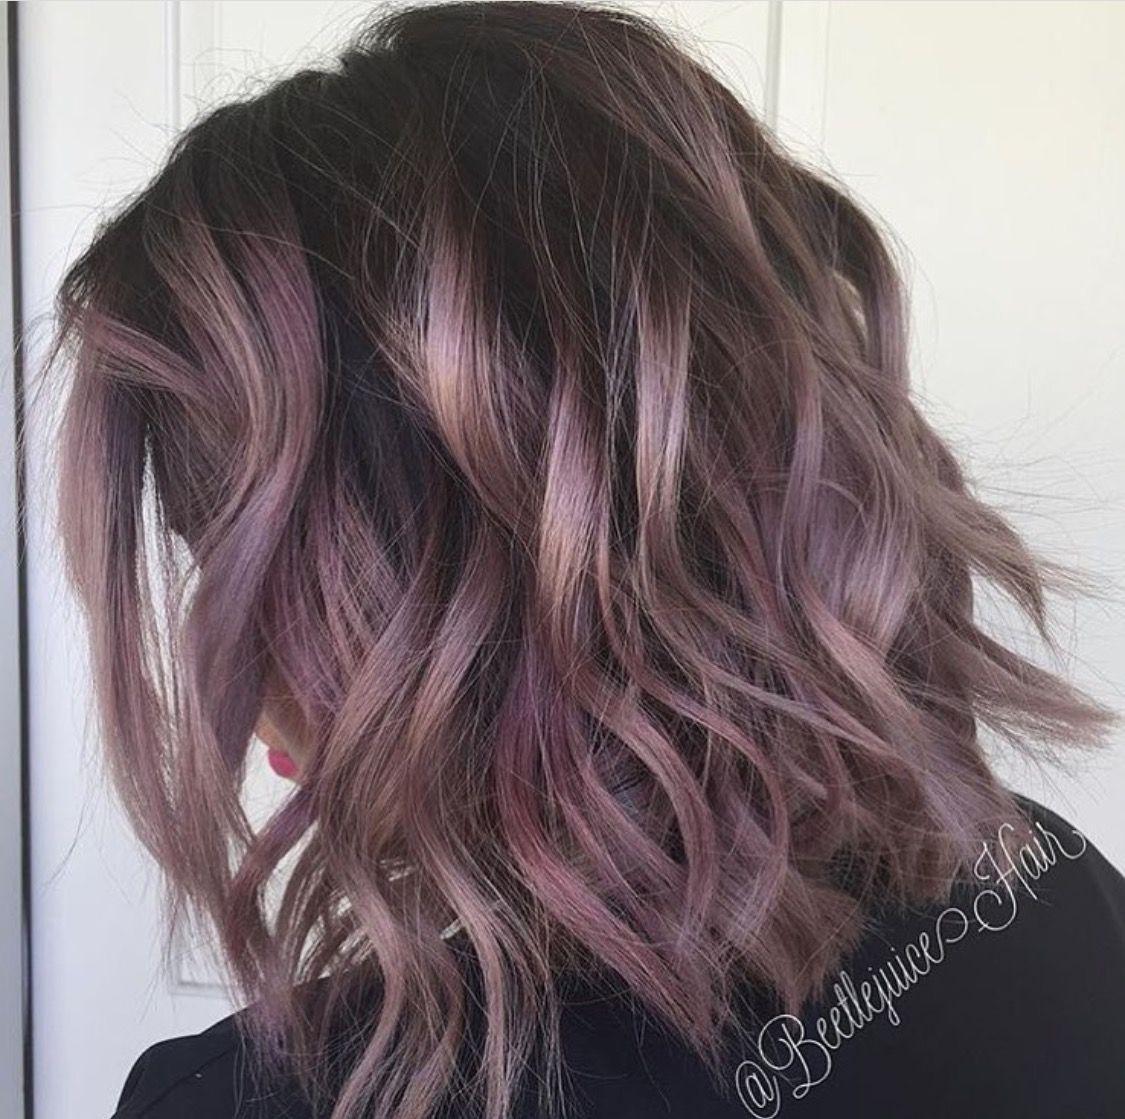 Pin by katarina anzur on hair inspiration pinterest hair